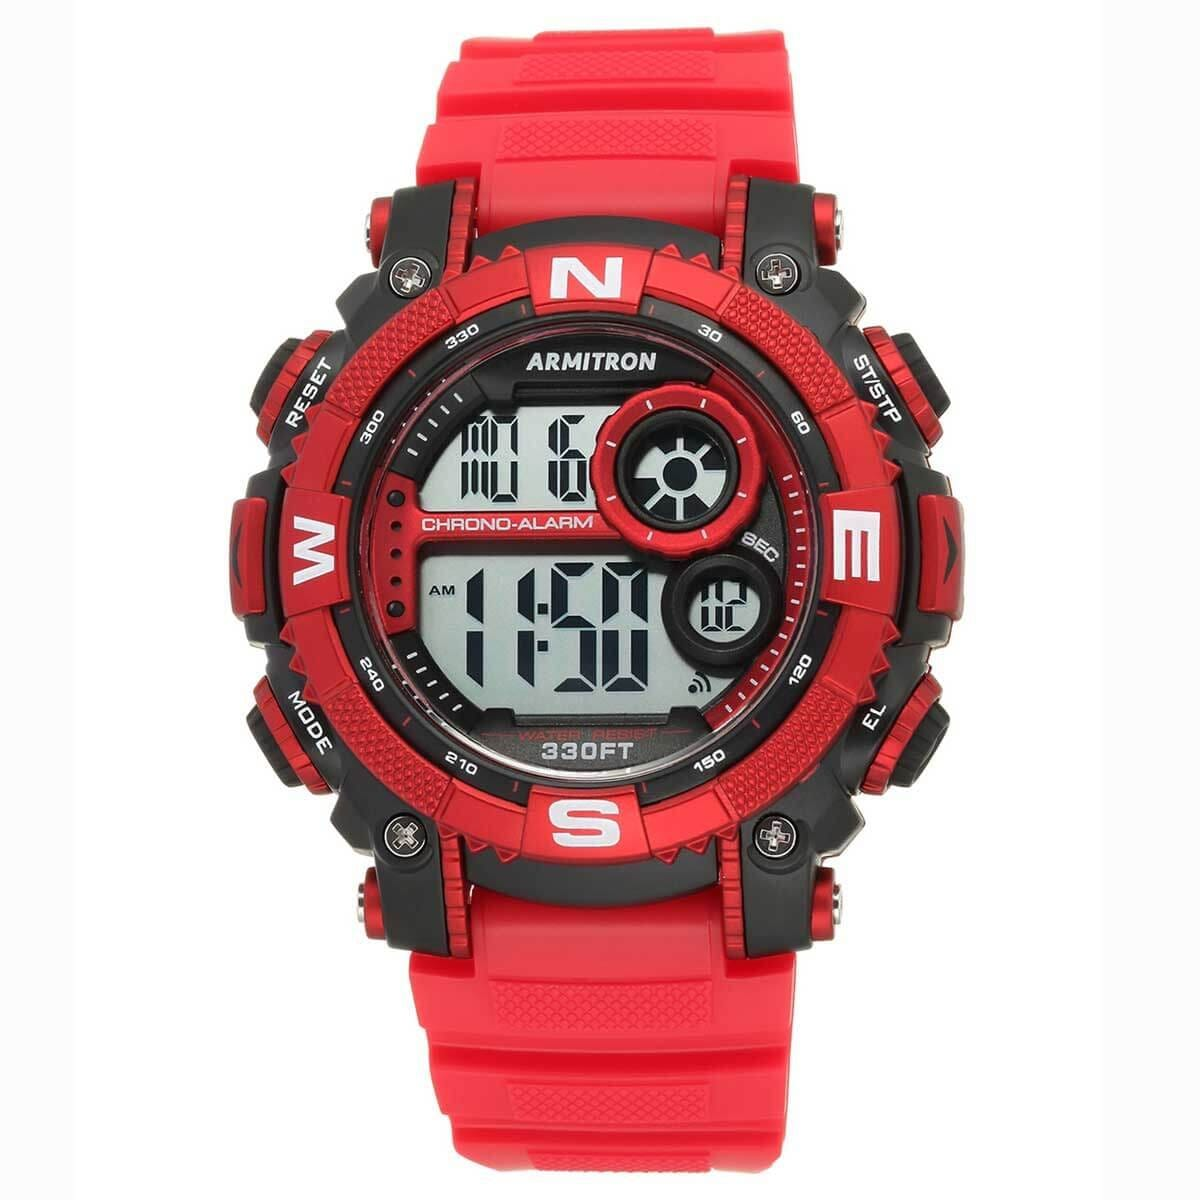 Reloj Caballero Armitron Pro Sport 408284Rdbk